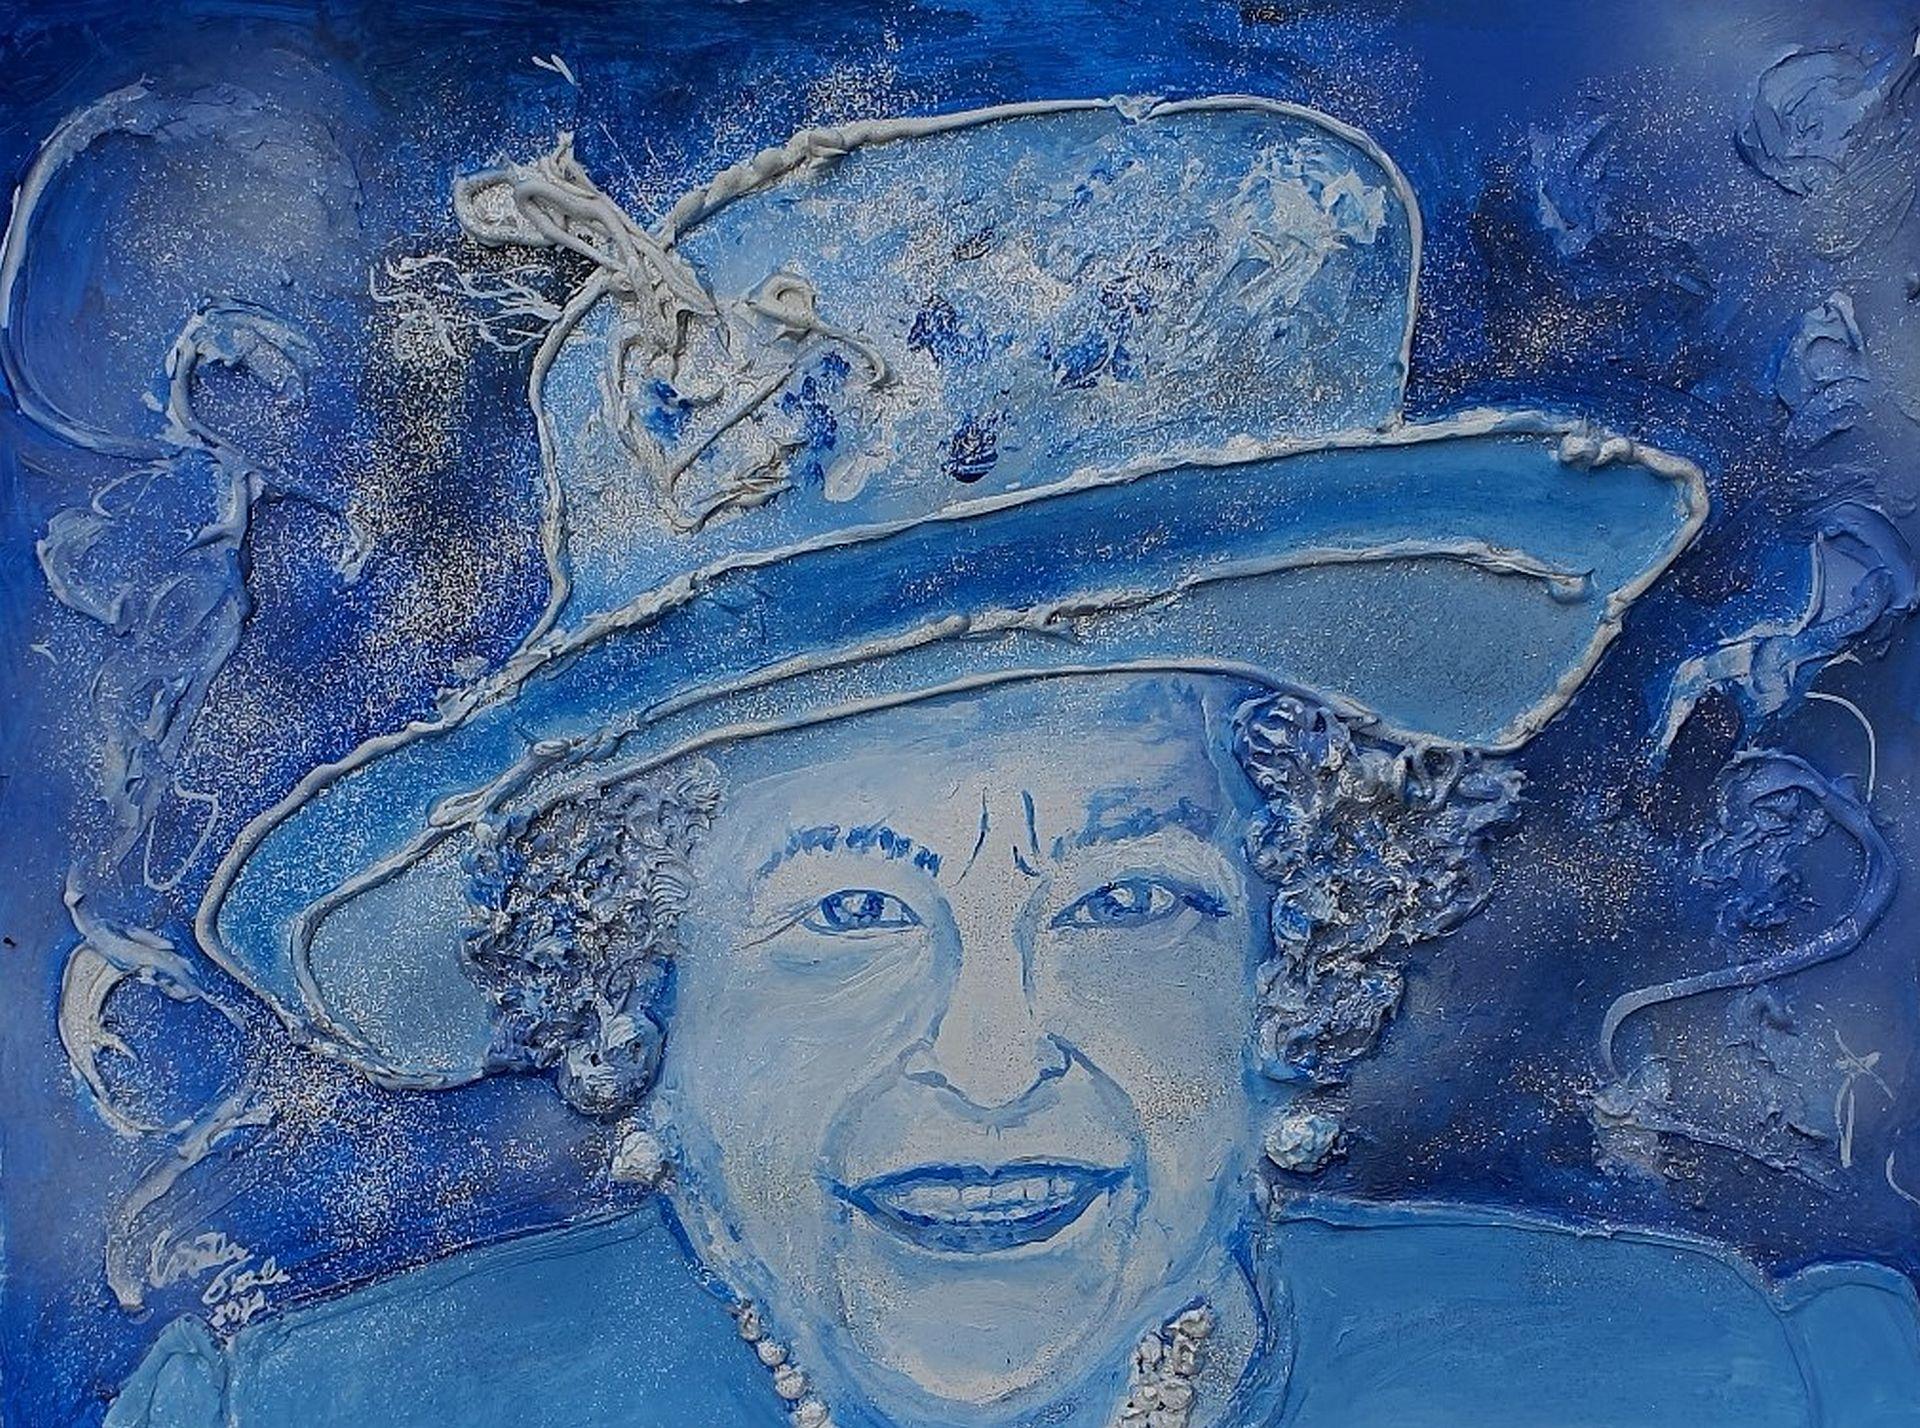 Queen Elizabeth II. (Technik: Acryl, Mixed Media pp. on paper, 42 X 56 X 0,2 cm)